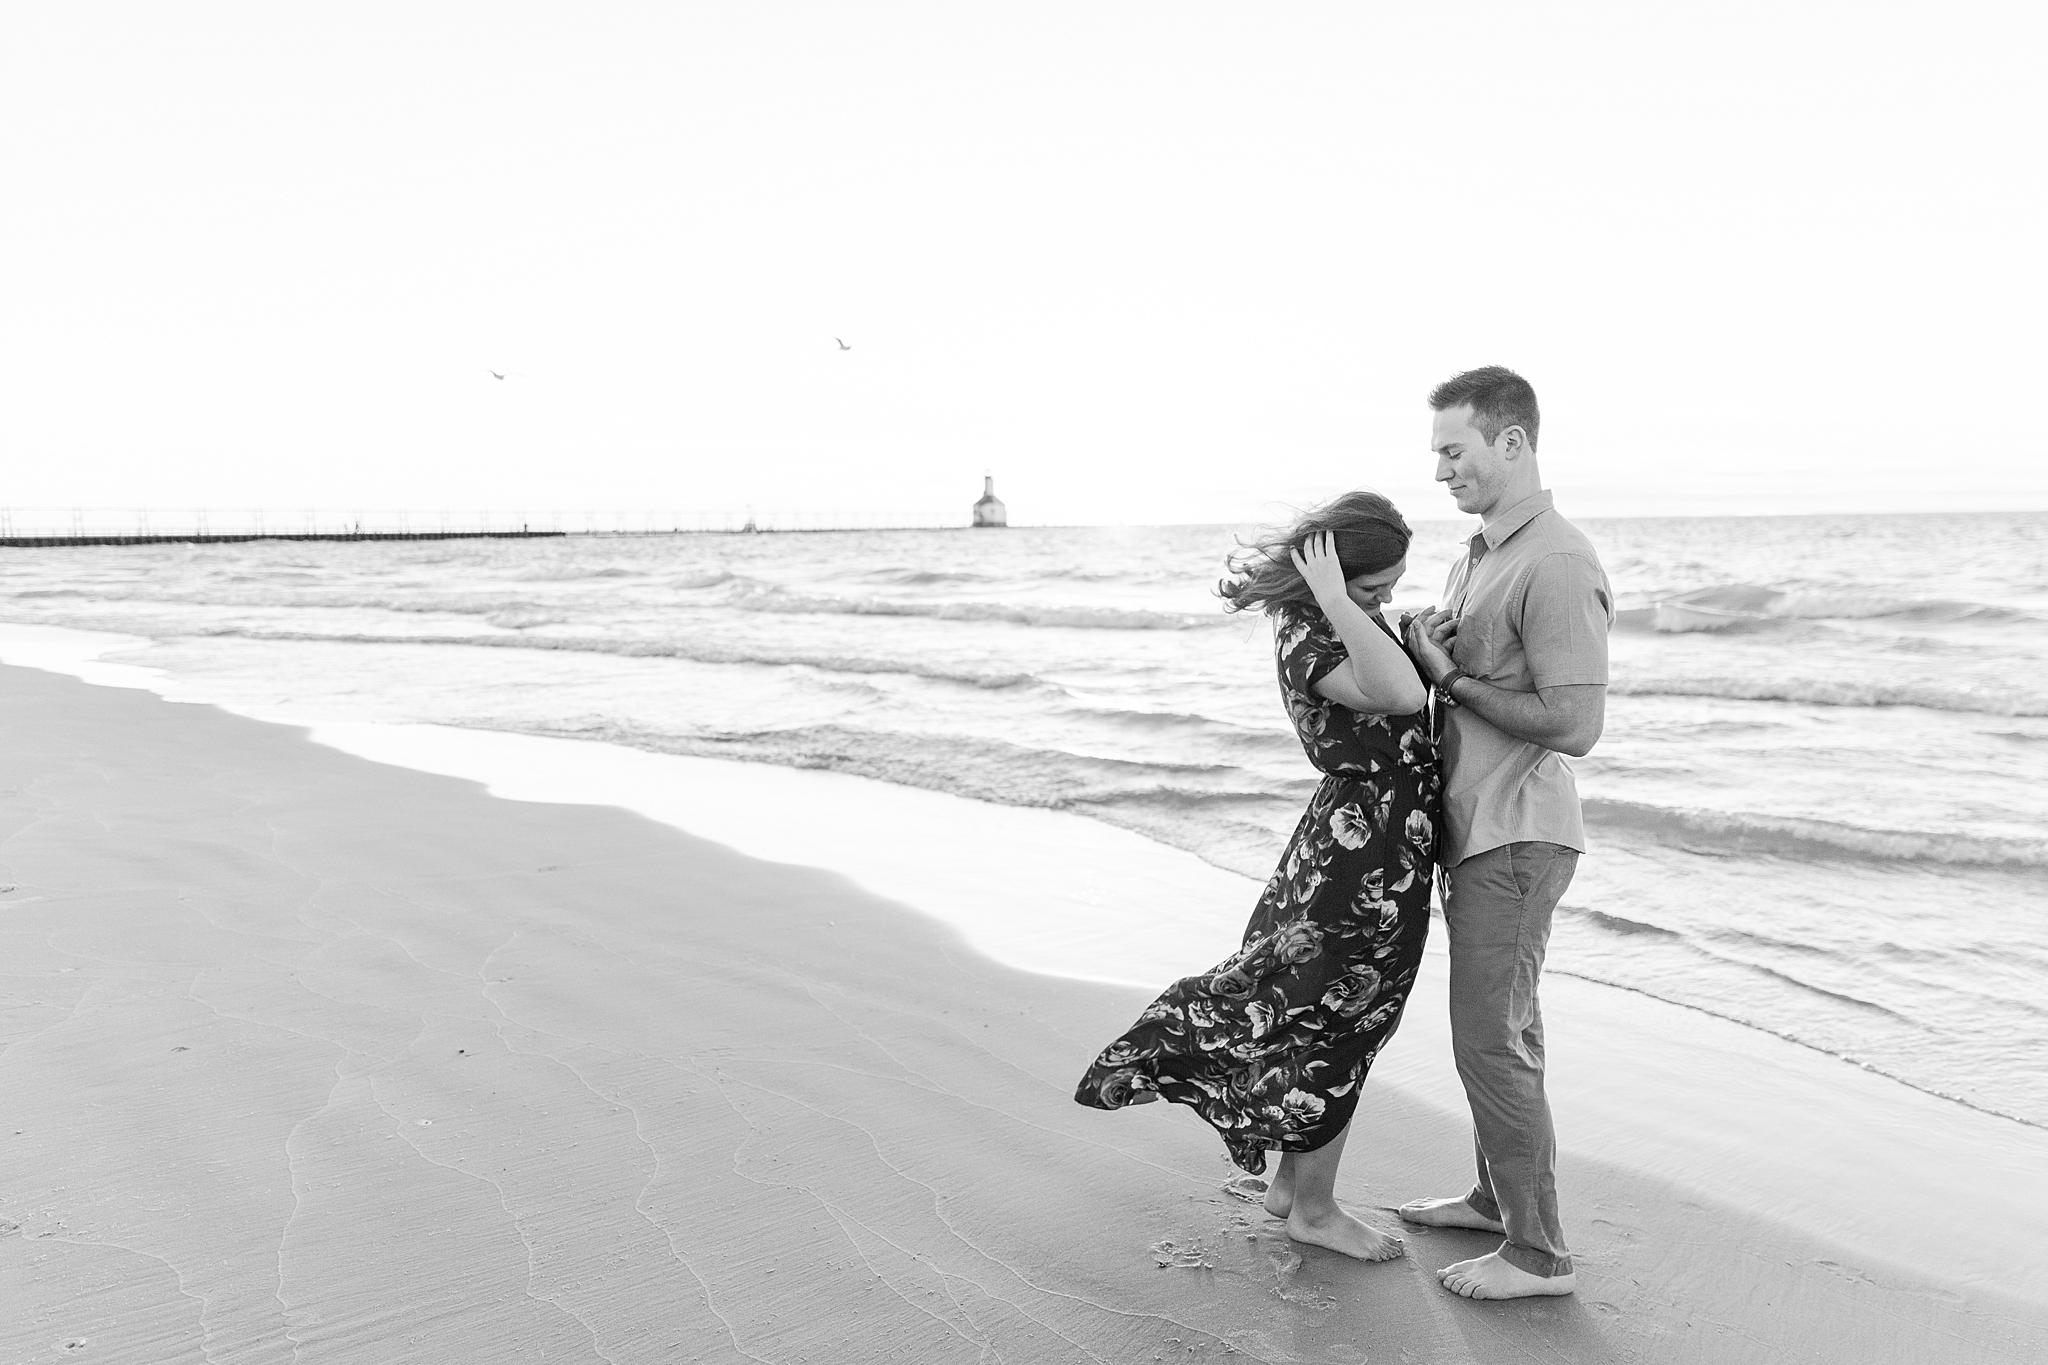 romantic--summer-beach-engagement-photography-in-st-joseph-mi-by-courtney-carolyn-photography_0012.jpg